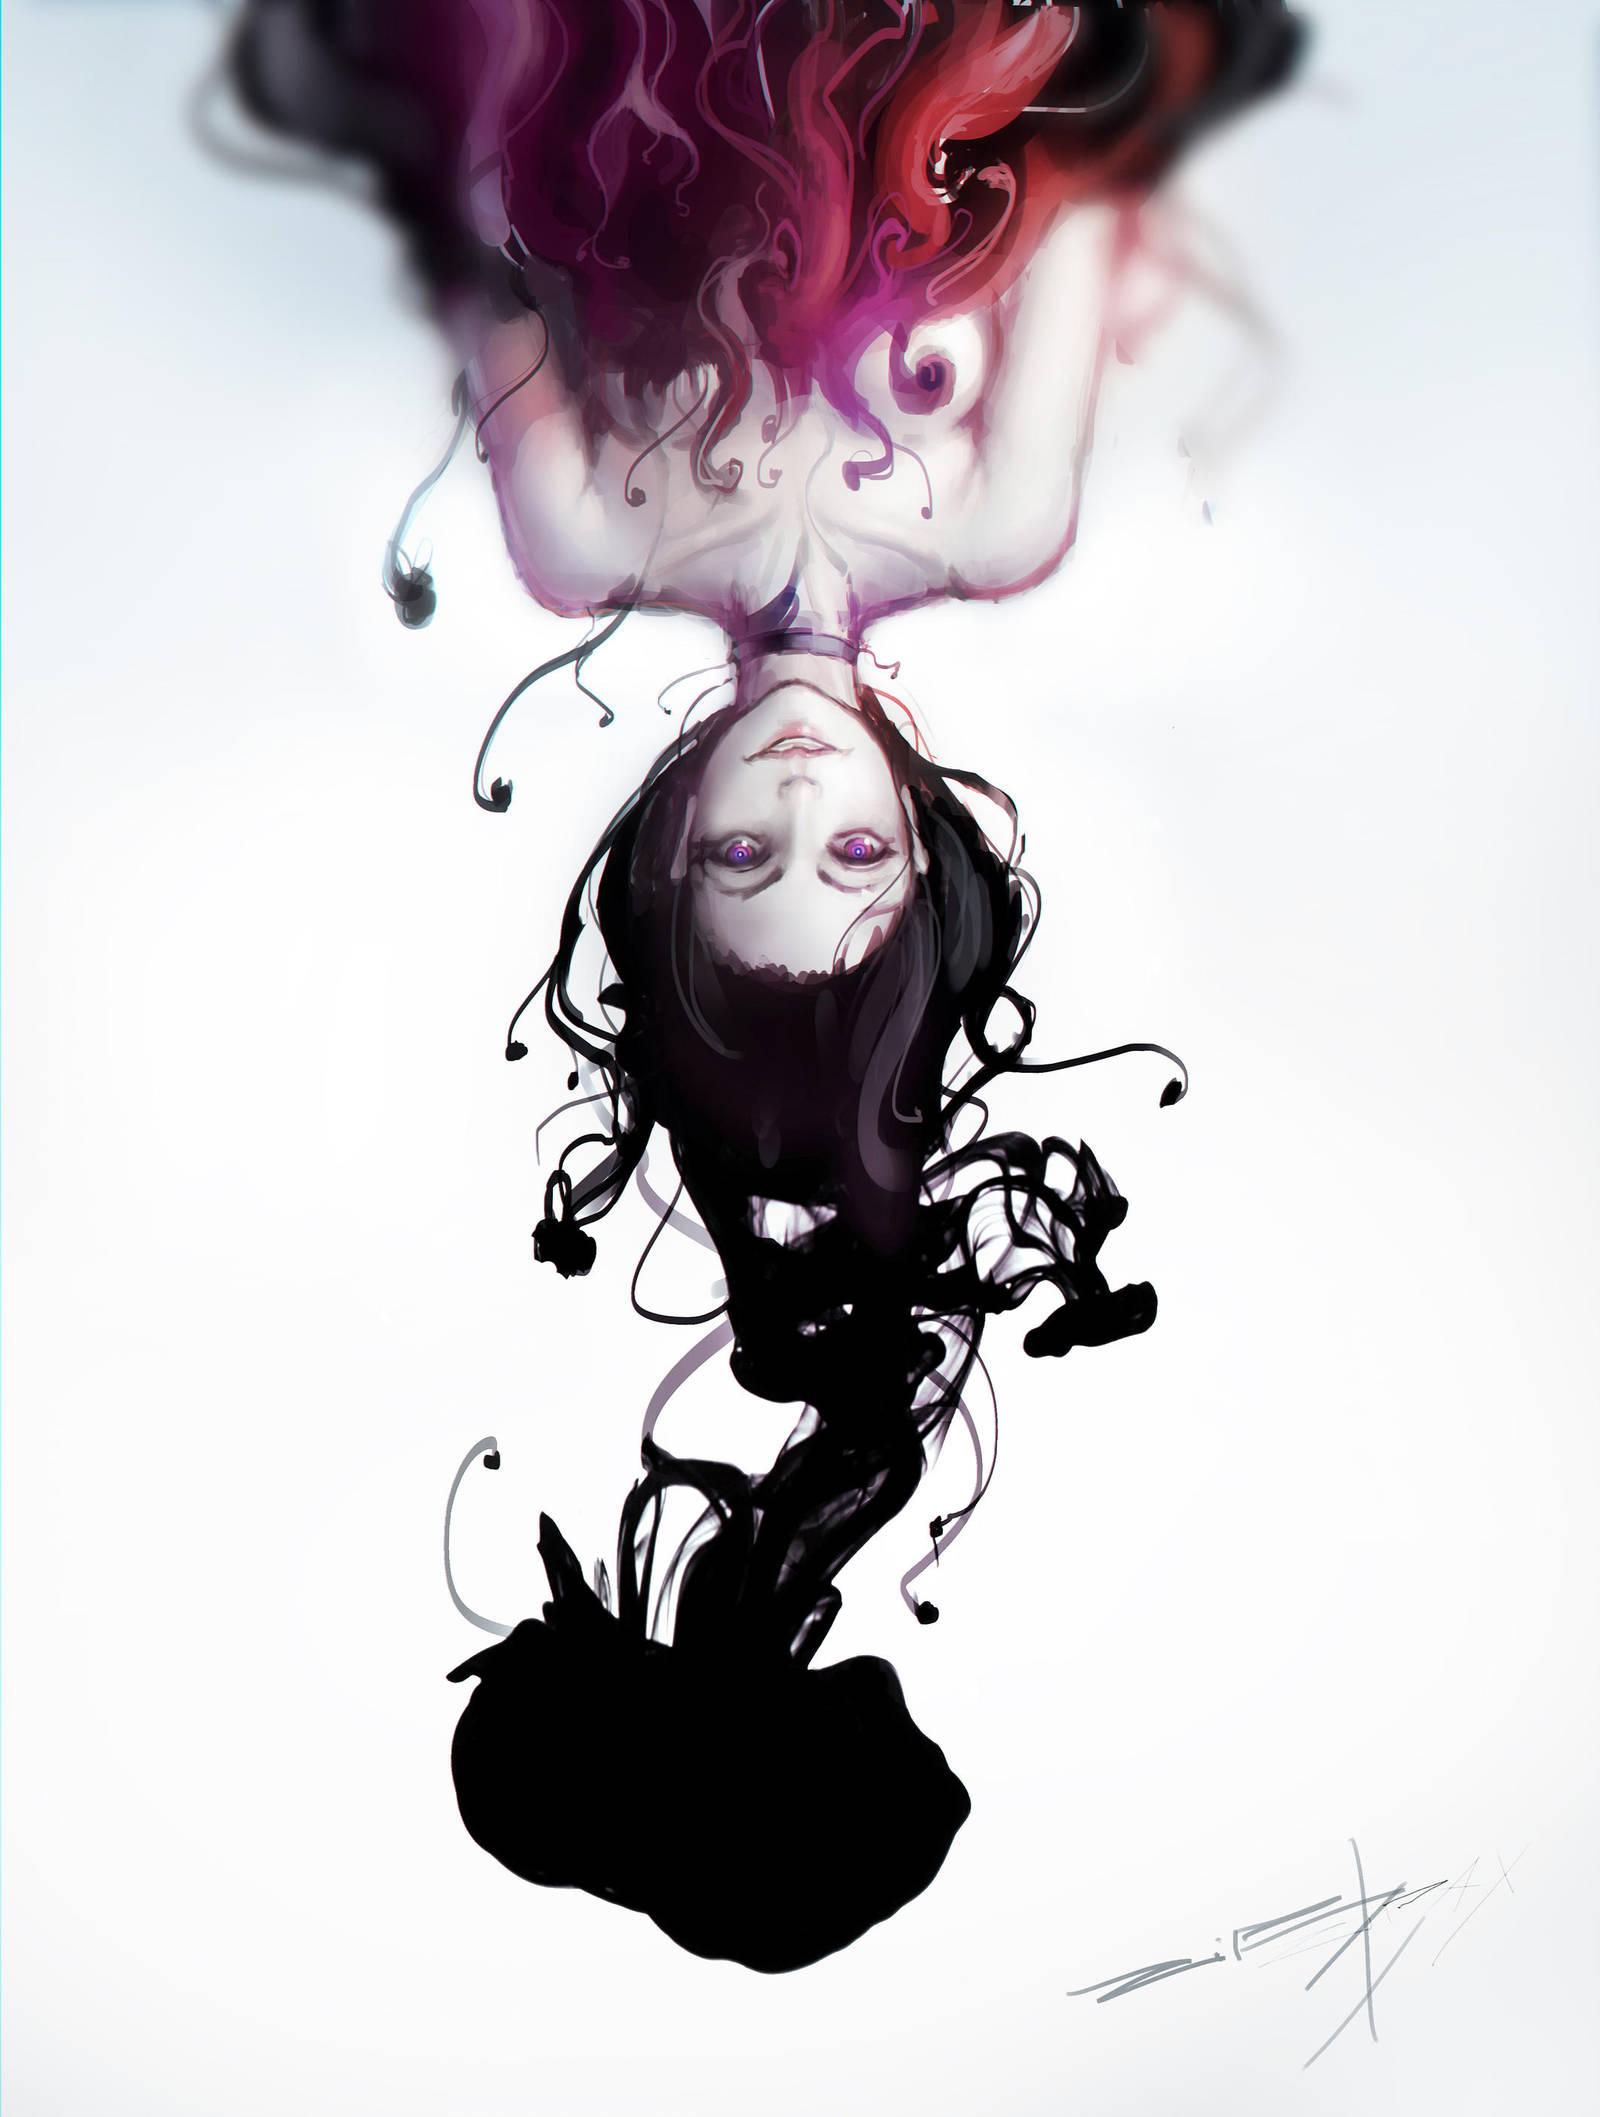 Ink by Zikwaga